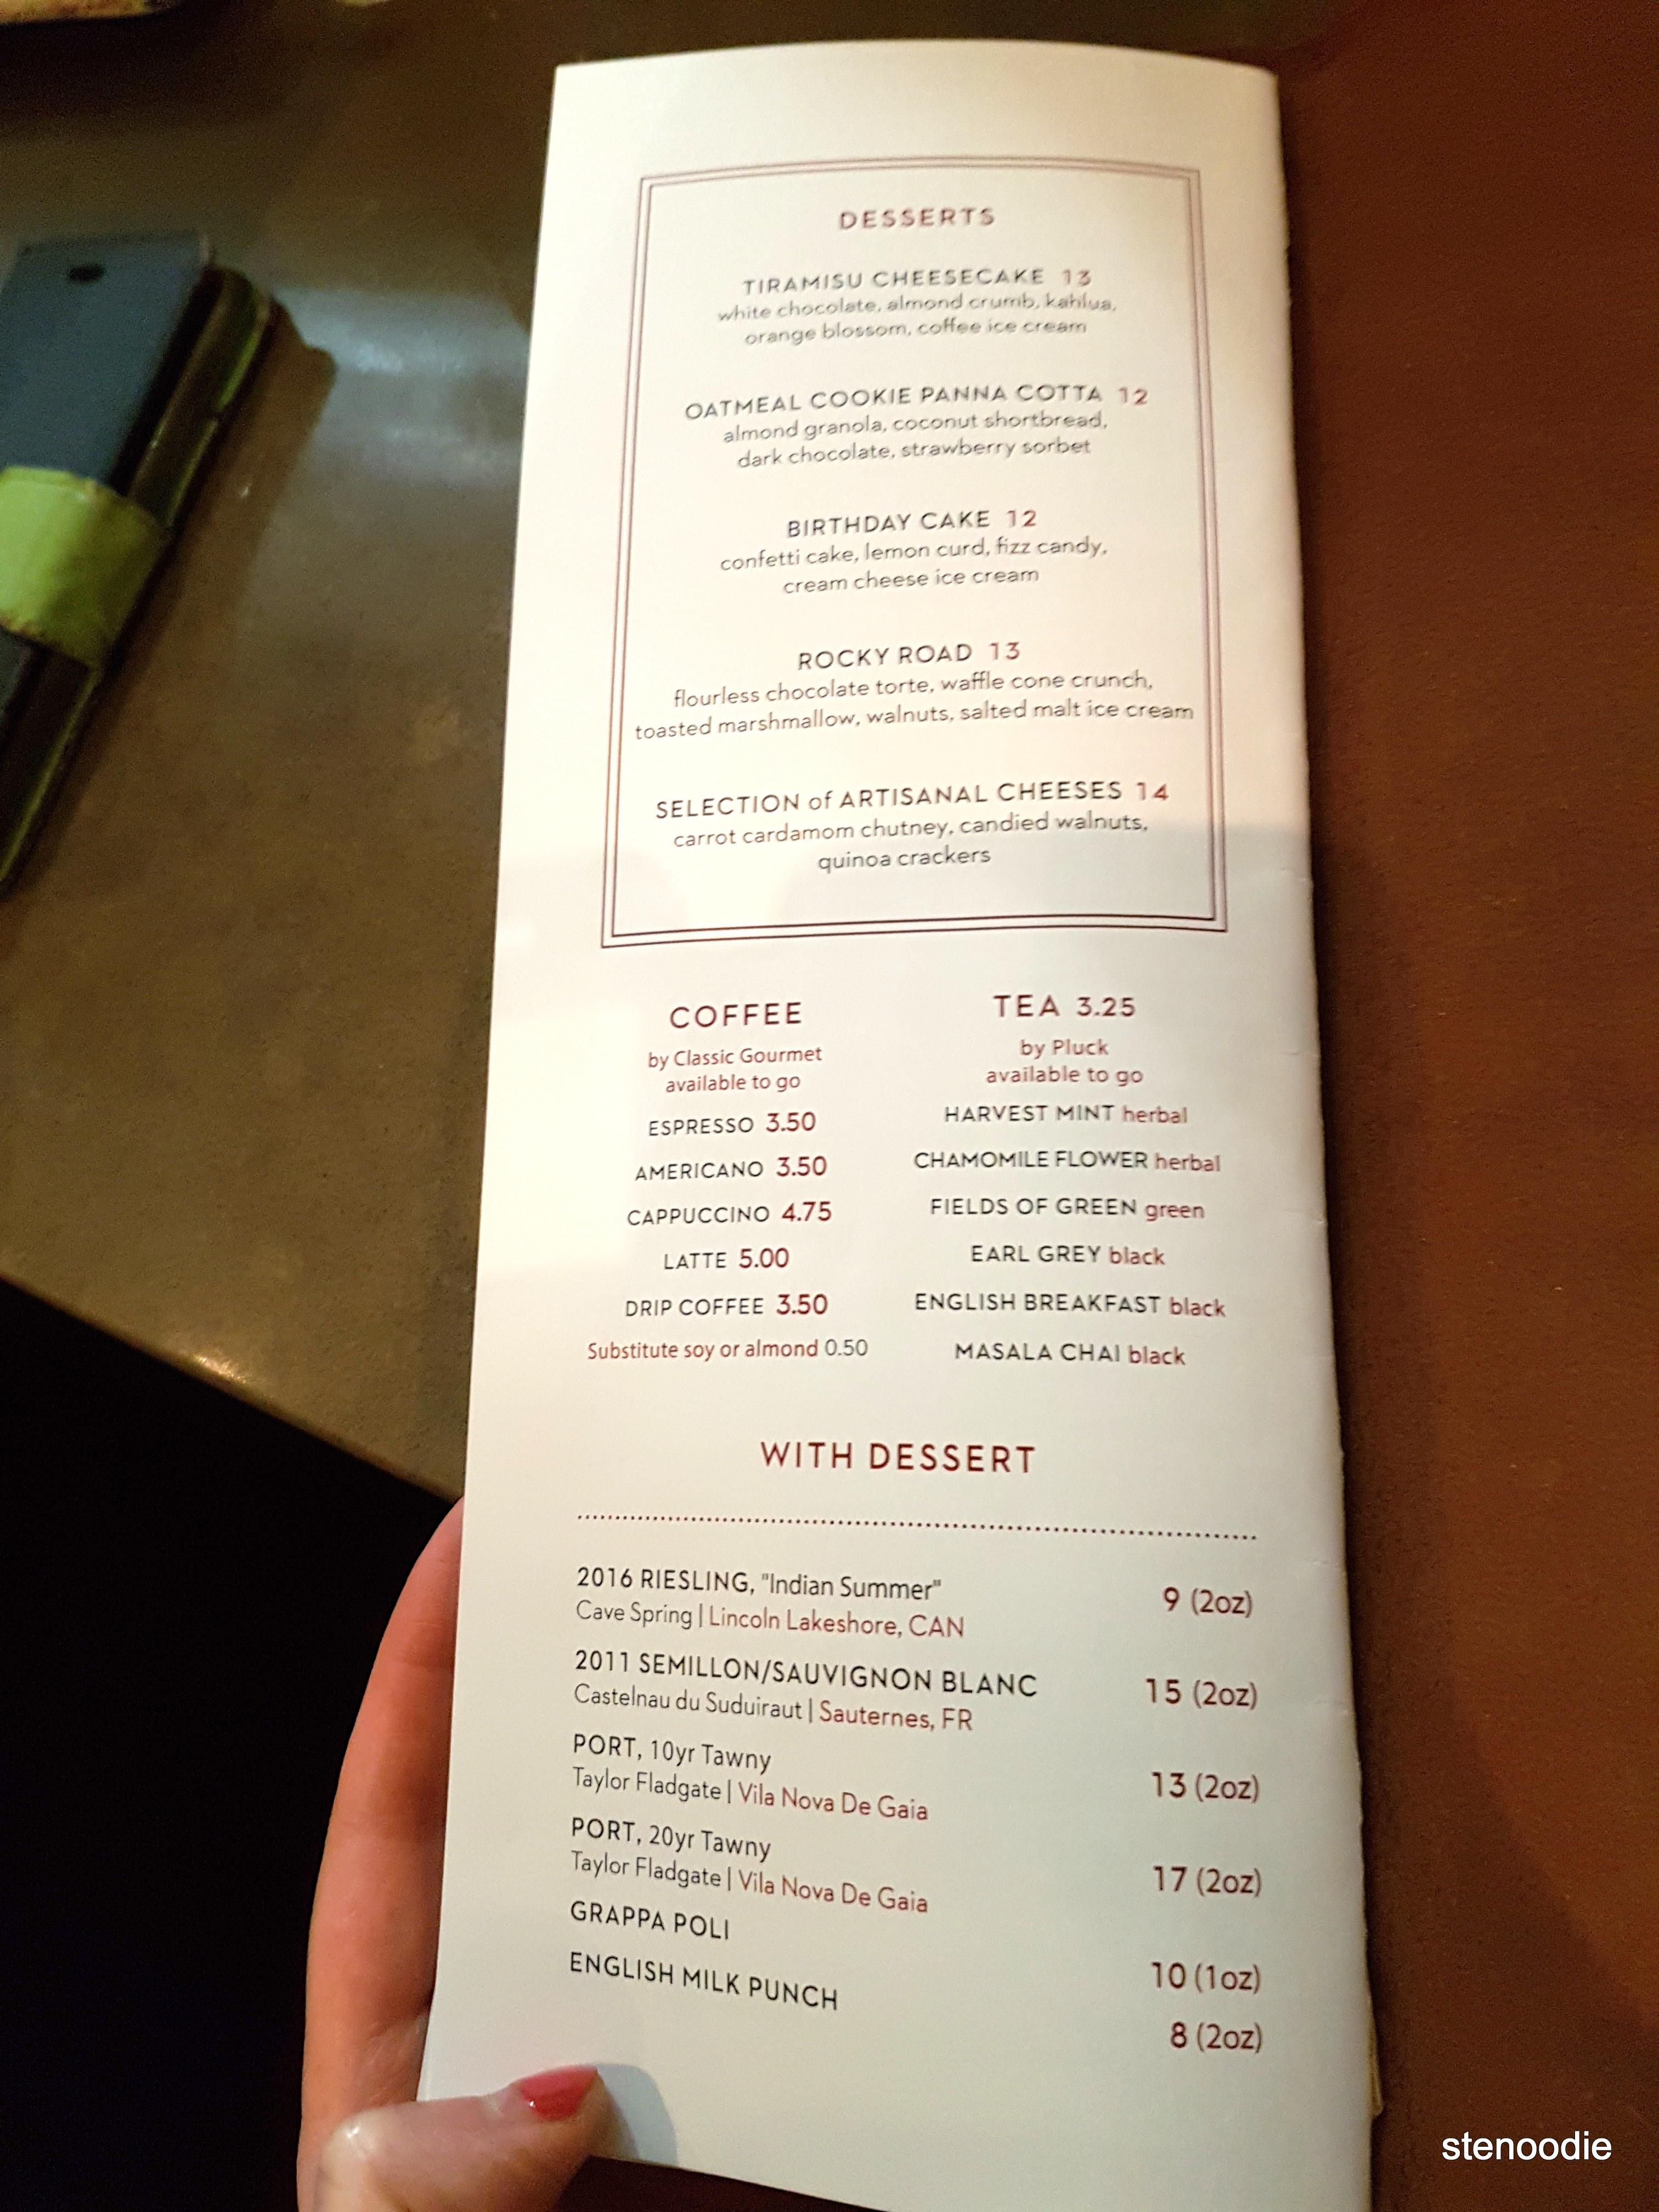 Richmond Station desserts and drinks menu